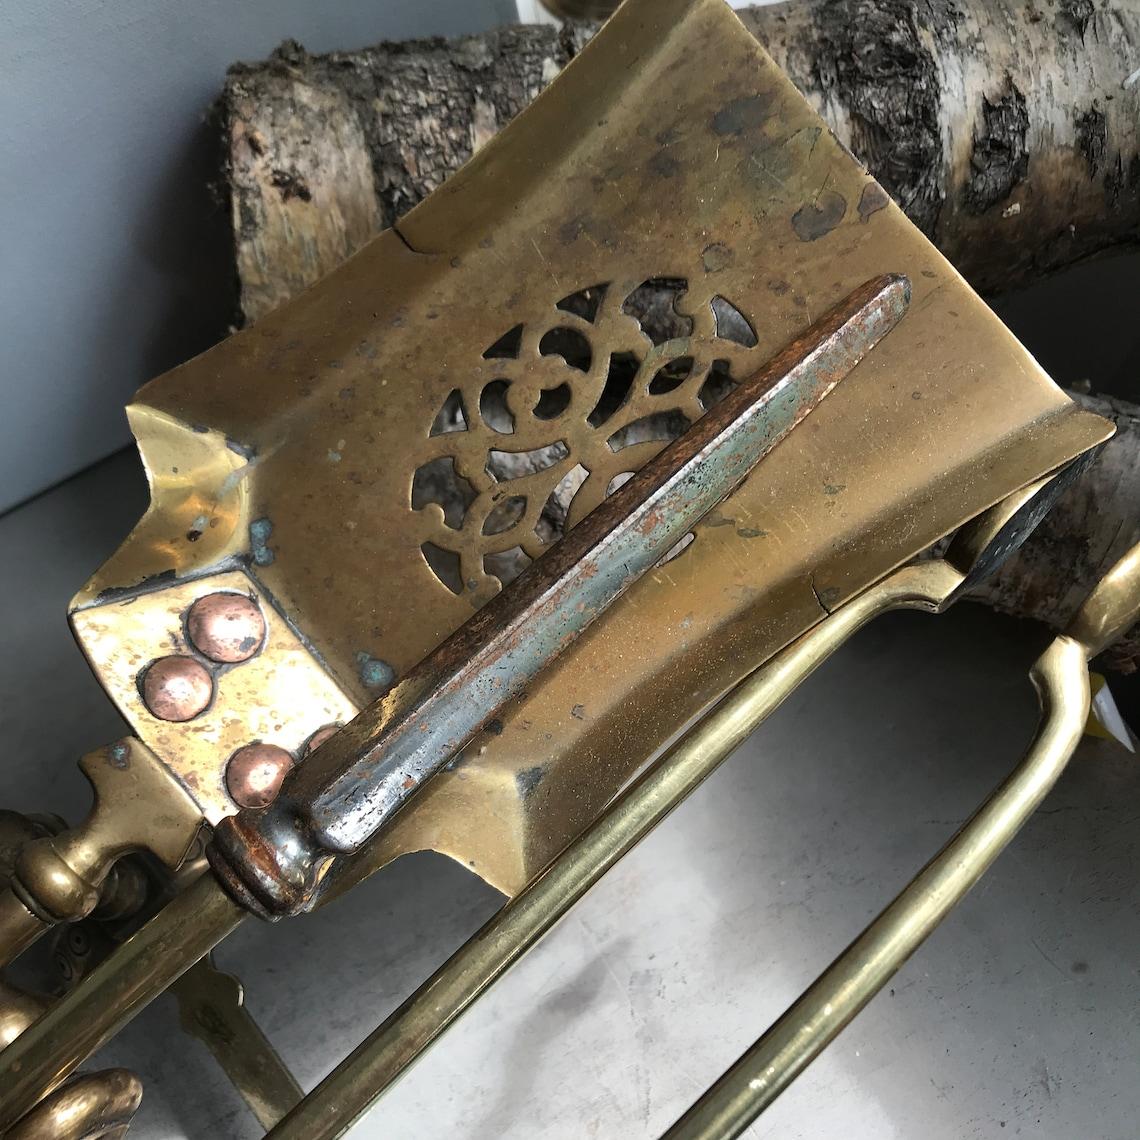 Vintage companion set, Hearth tool set, Poker Dustpan Tongs, Fireplace tools set, Fire accessories, Home decor